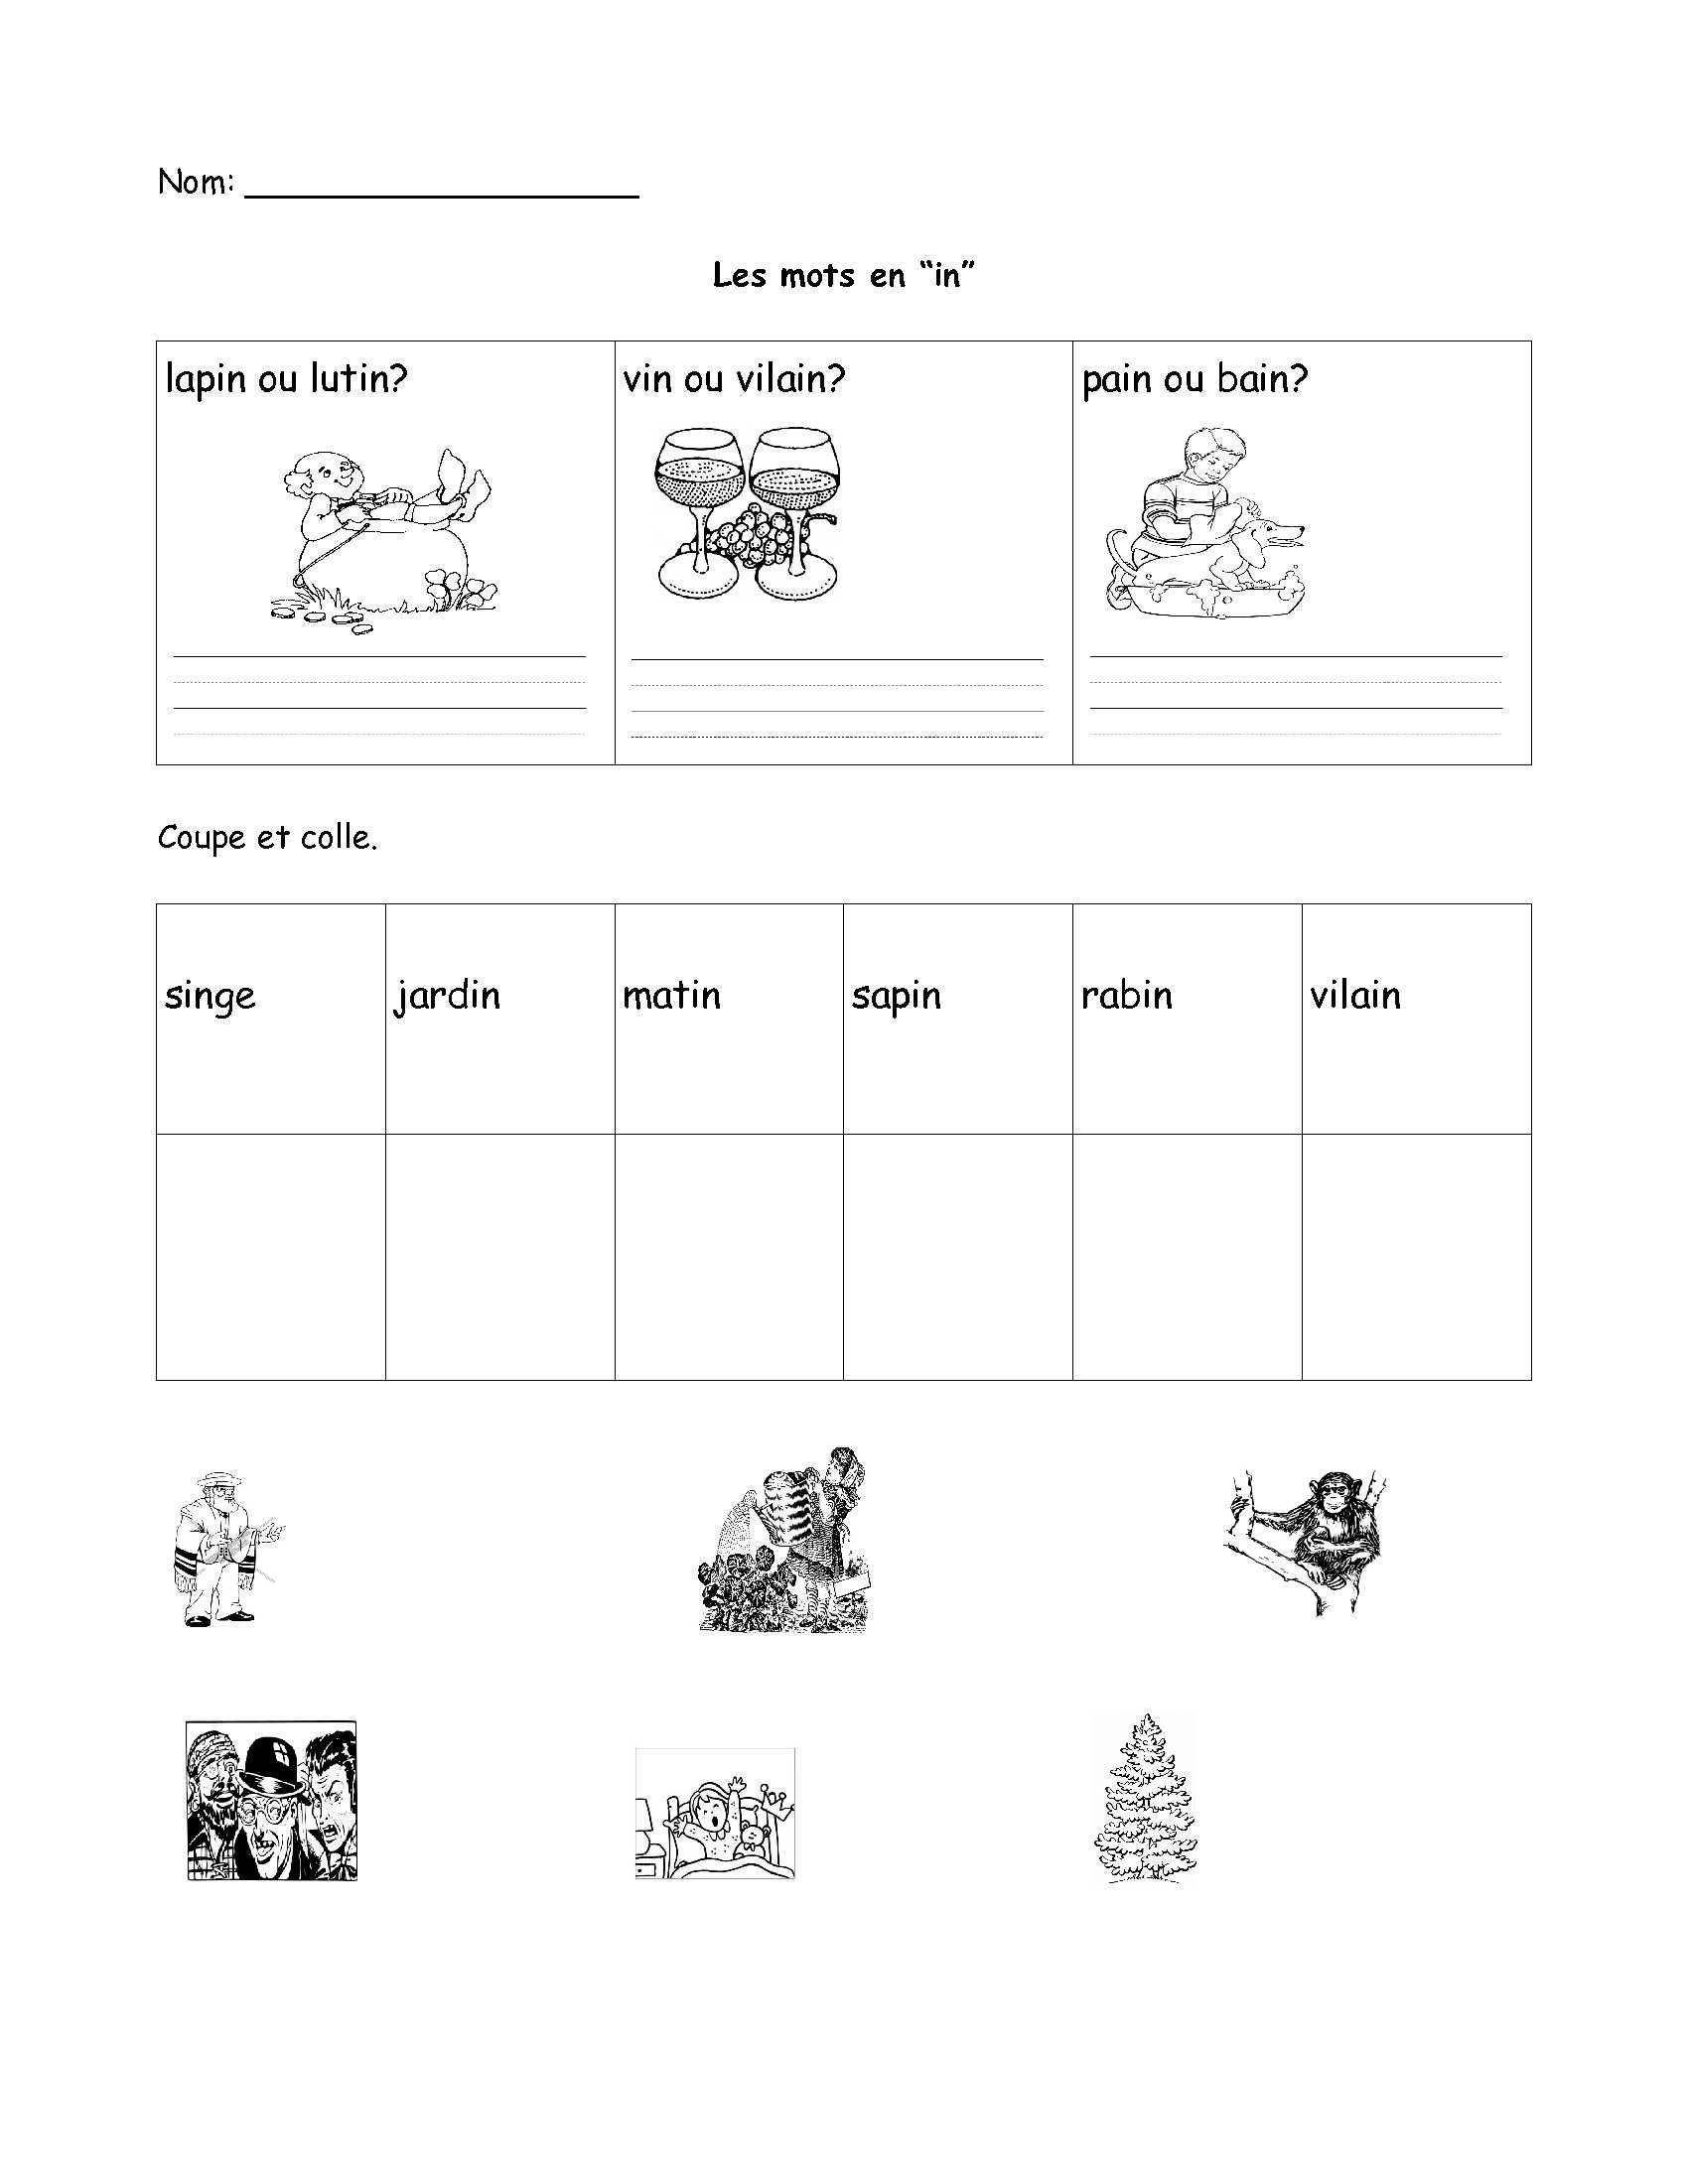 Free French Worksheet- Grade 1, Grade 2, Grade 3. Fsl, Core French | Grade 1 French Immersion Printable Worksheets